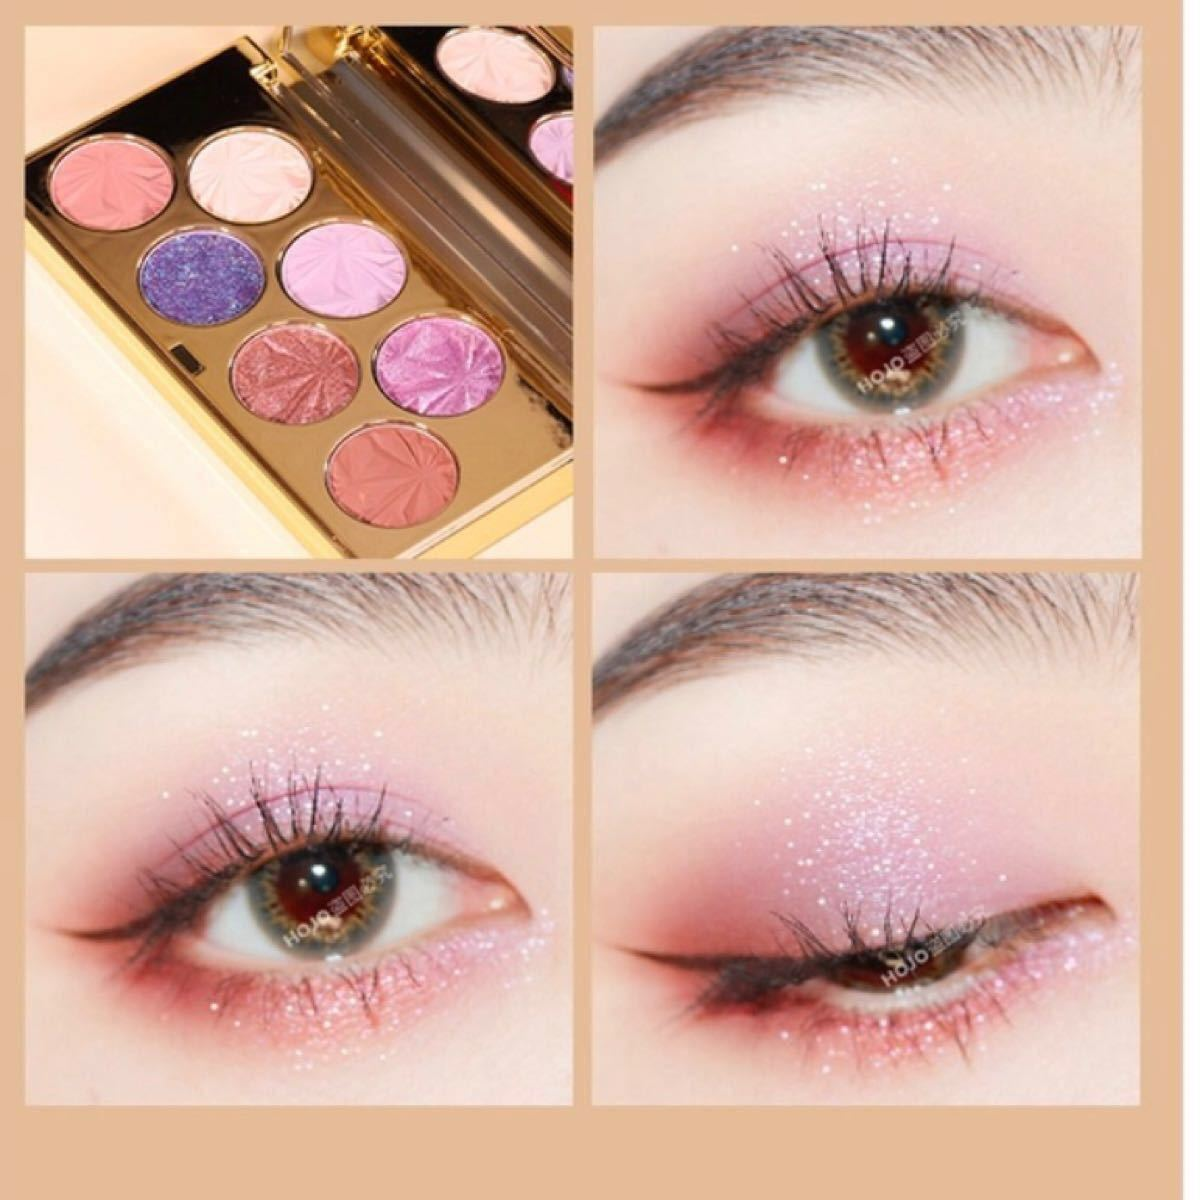 HOJO  アイシャドウパレット #03 dazzling eyeshadow